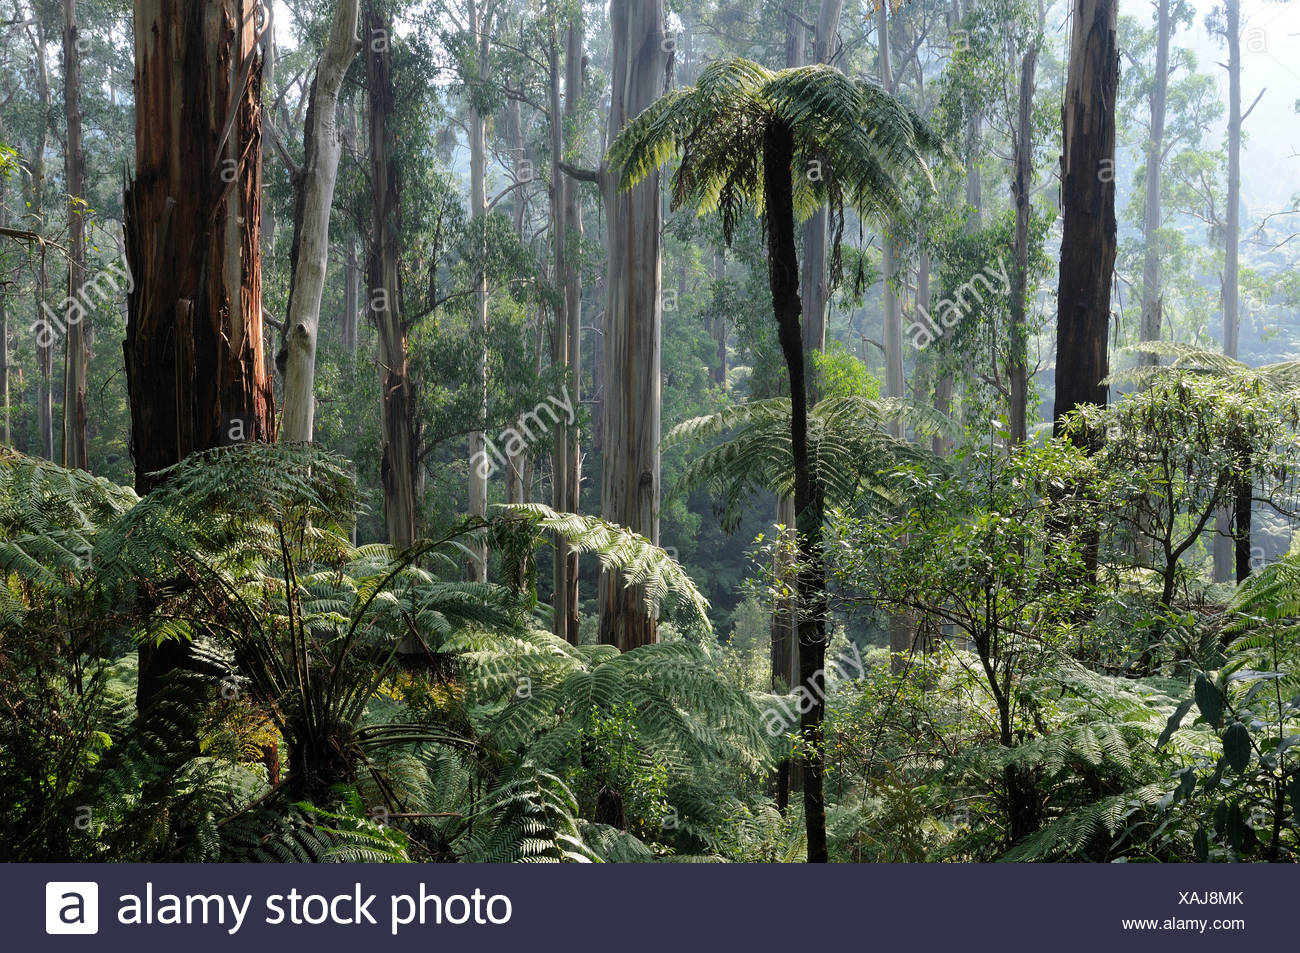 Royal eucalyptus (Eucalyptus regnans) and Soft tree-ferns (Dicksonia antarctica), Tarra Bulga National Park, Victoria, Australia. - Stock Image